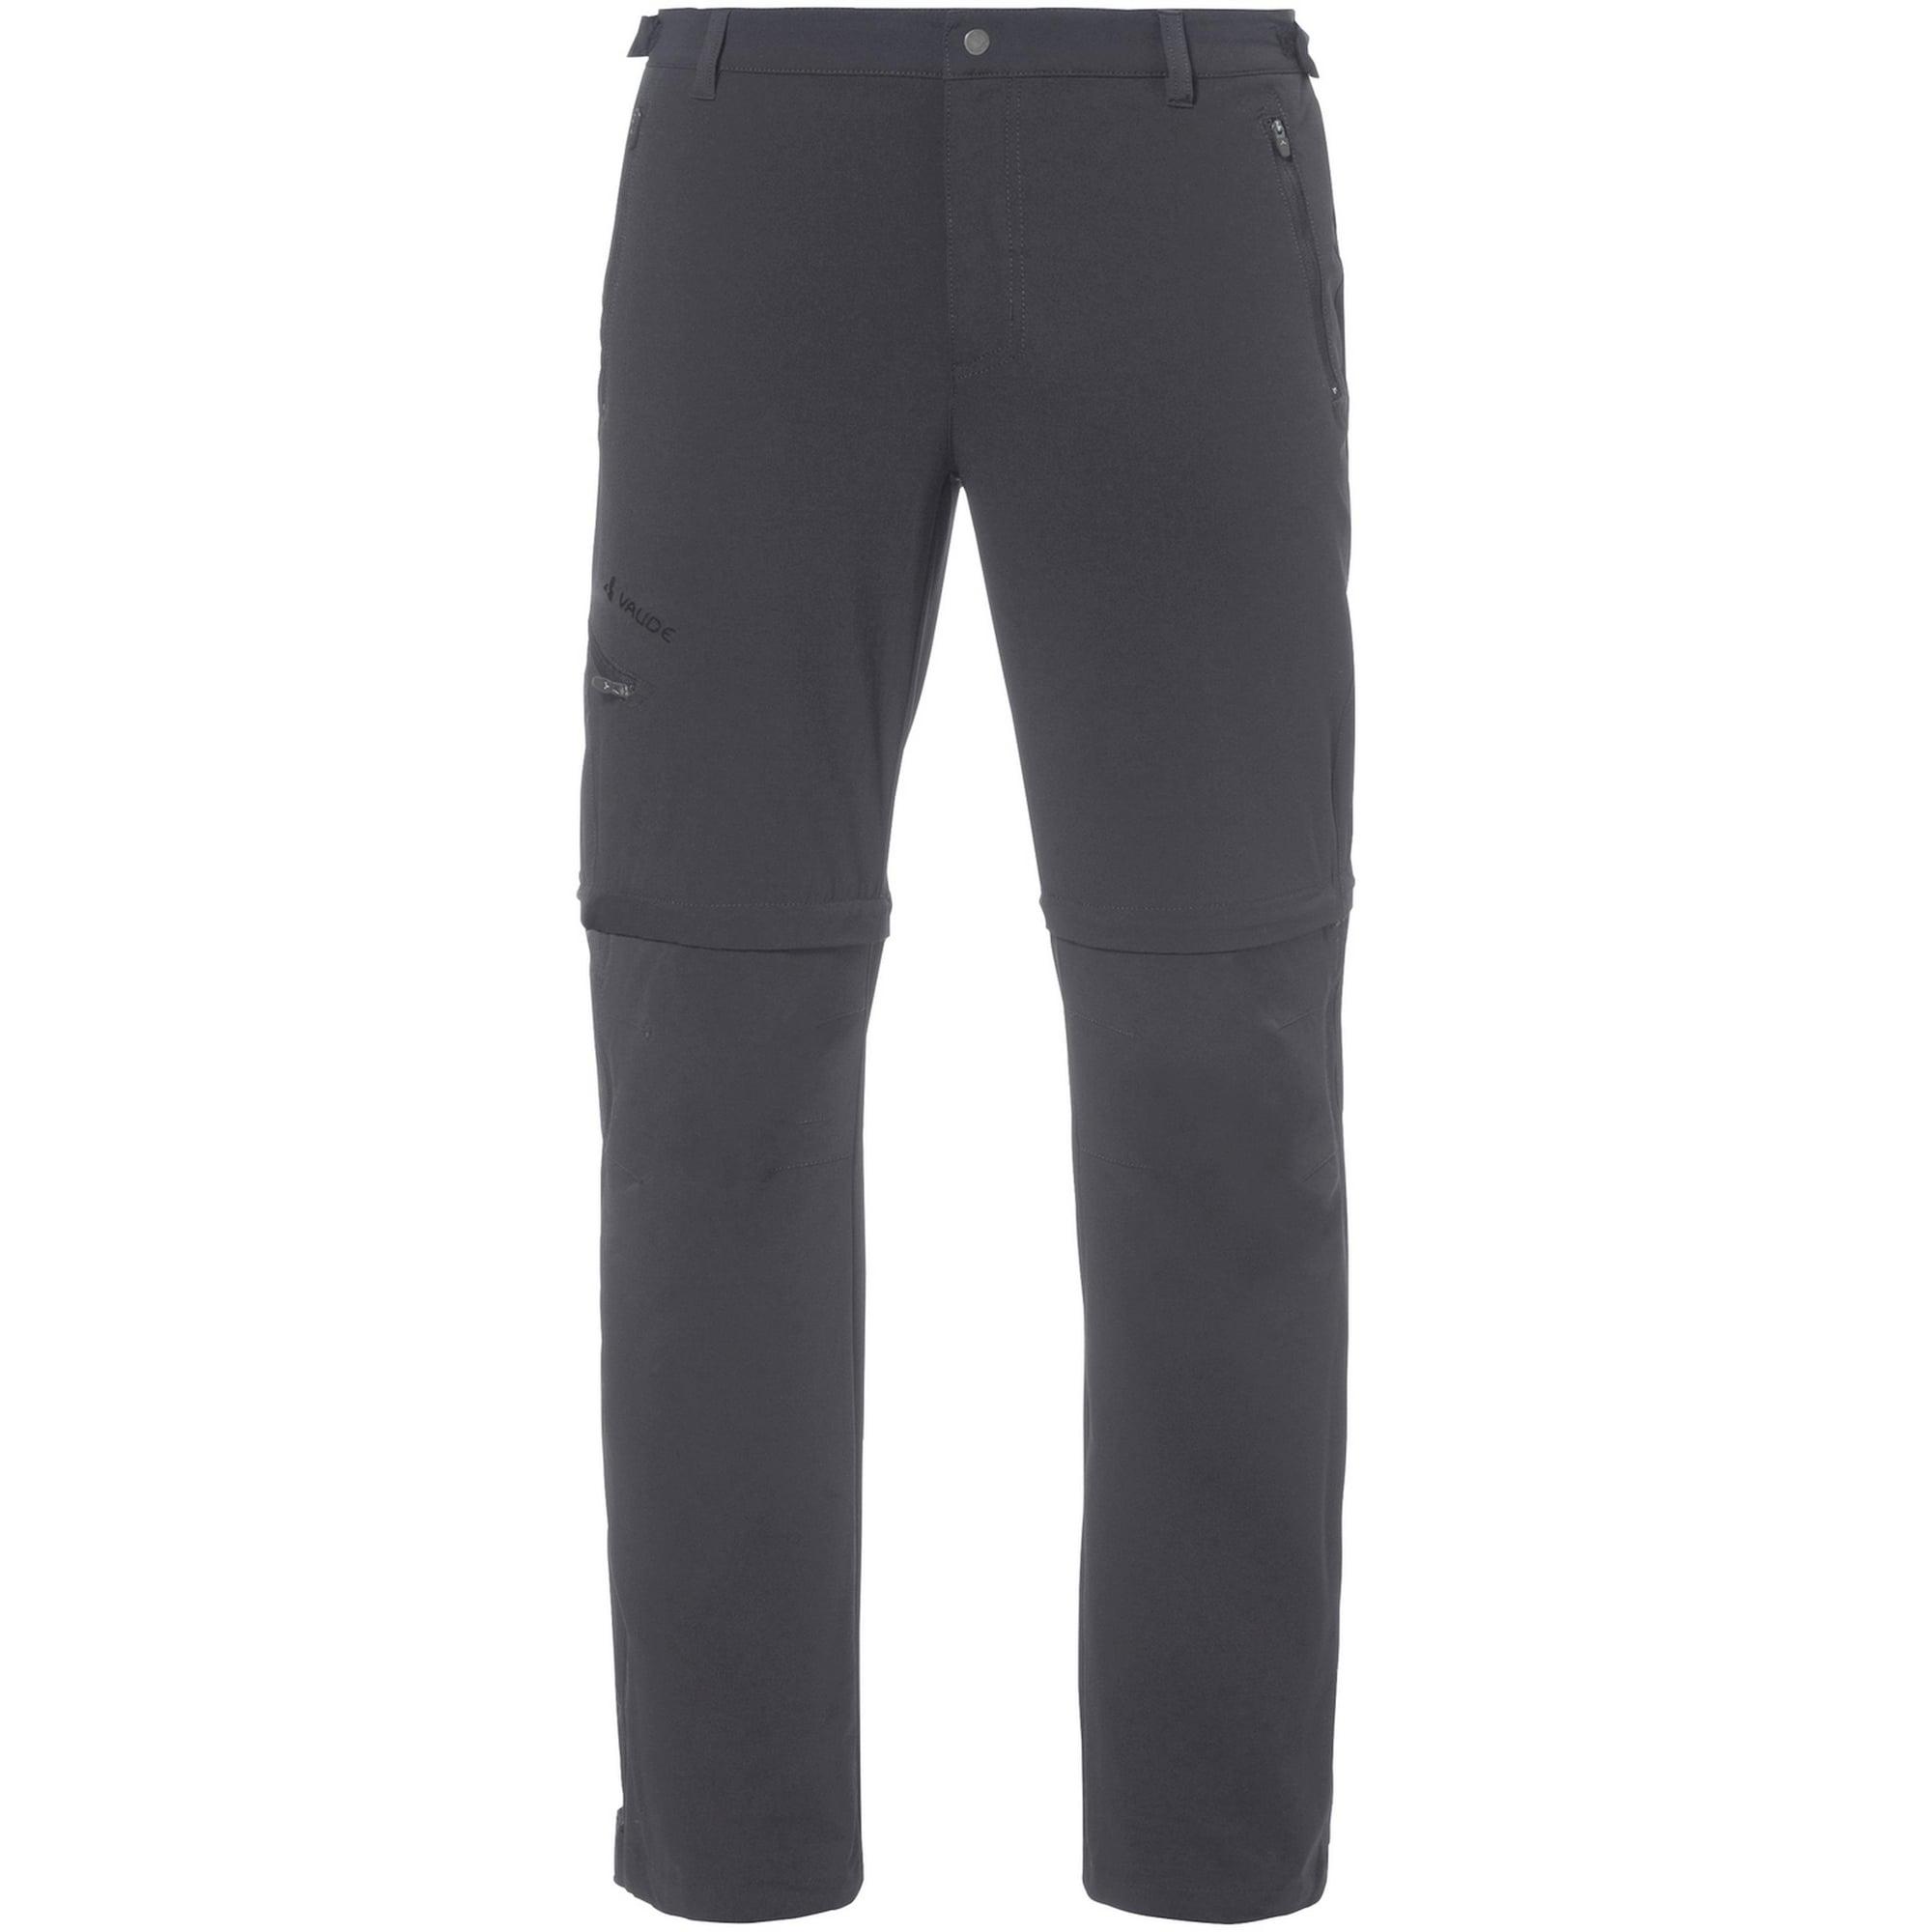 Softshellhose 'Farley' | Sportbekleidung > Sporthosen > Softshellhosen | Anthrazit | Vaude